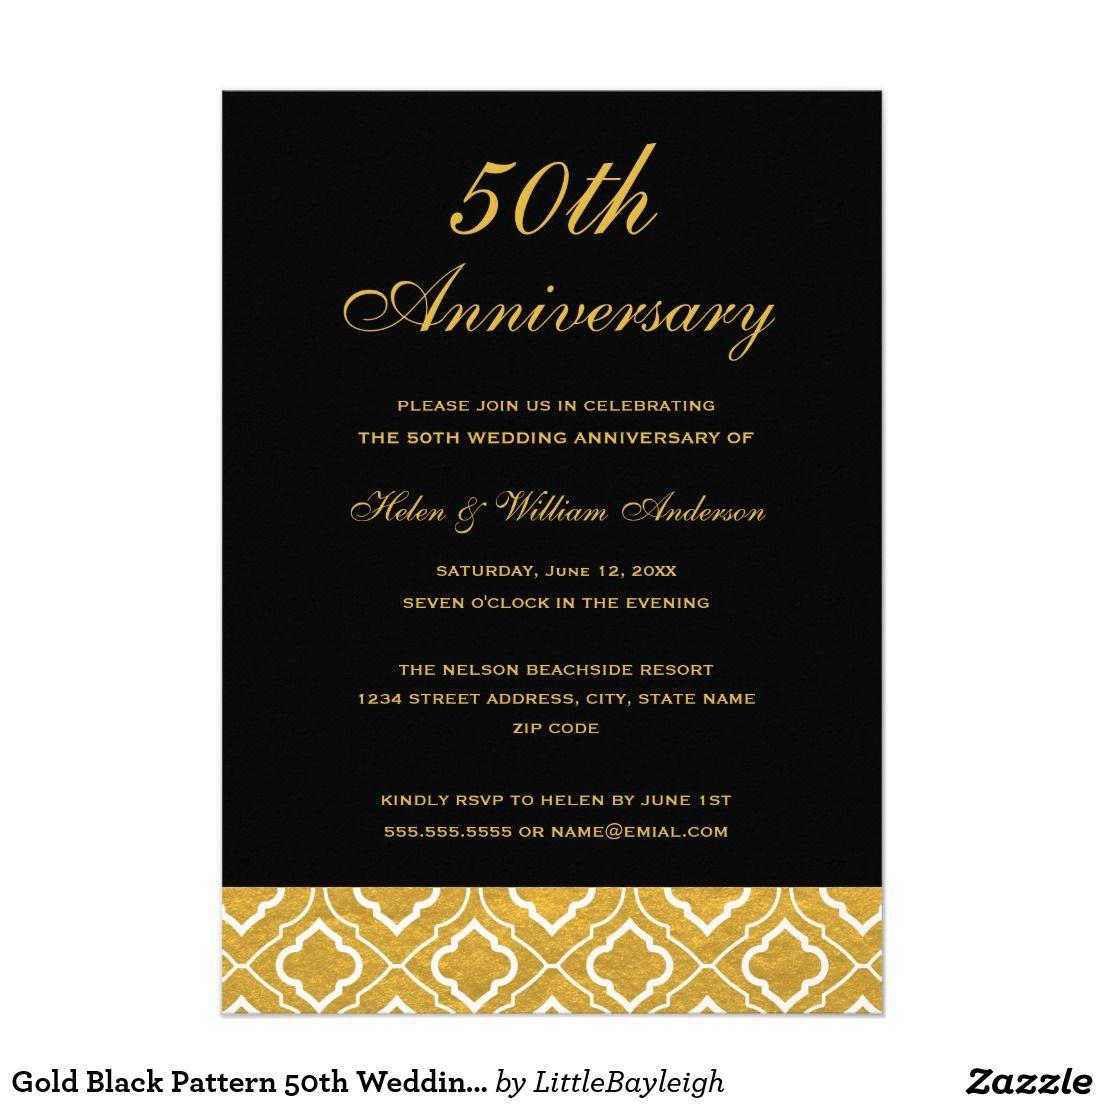 Gold Black Pattern 50th Wedding Anniversary Invitation Zazzle Com Wedding Anniversary Invitations Anniversary Invitations 50th Wedding Anniversary Invitations